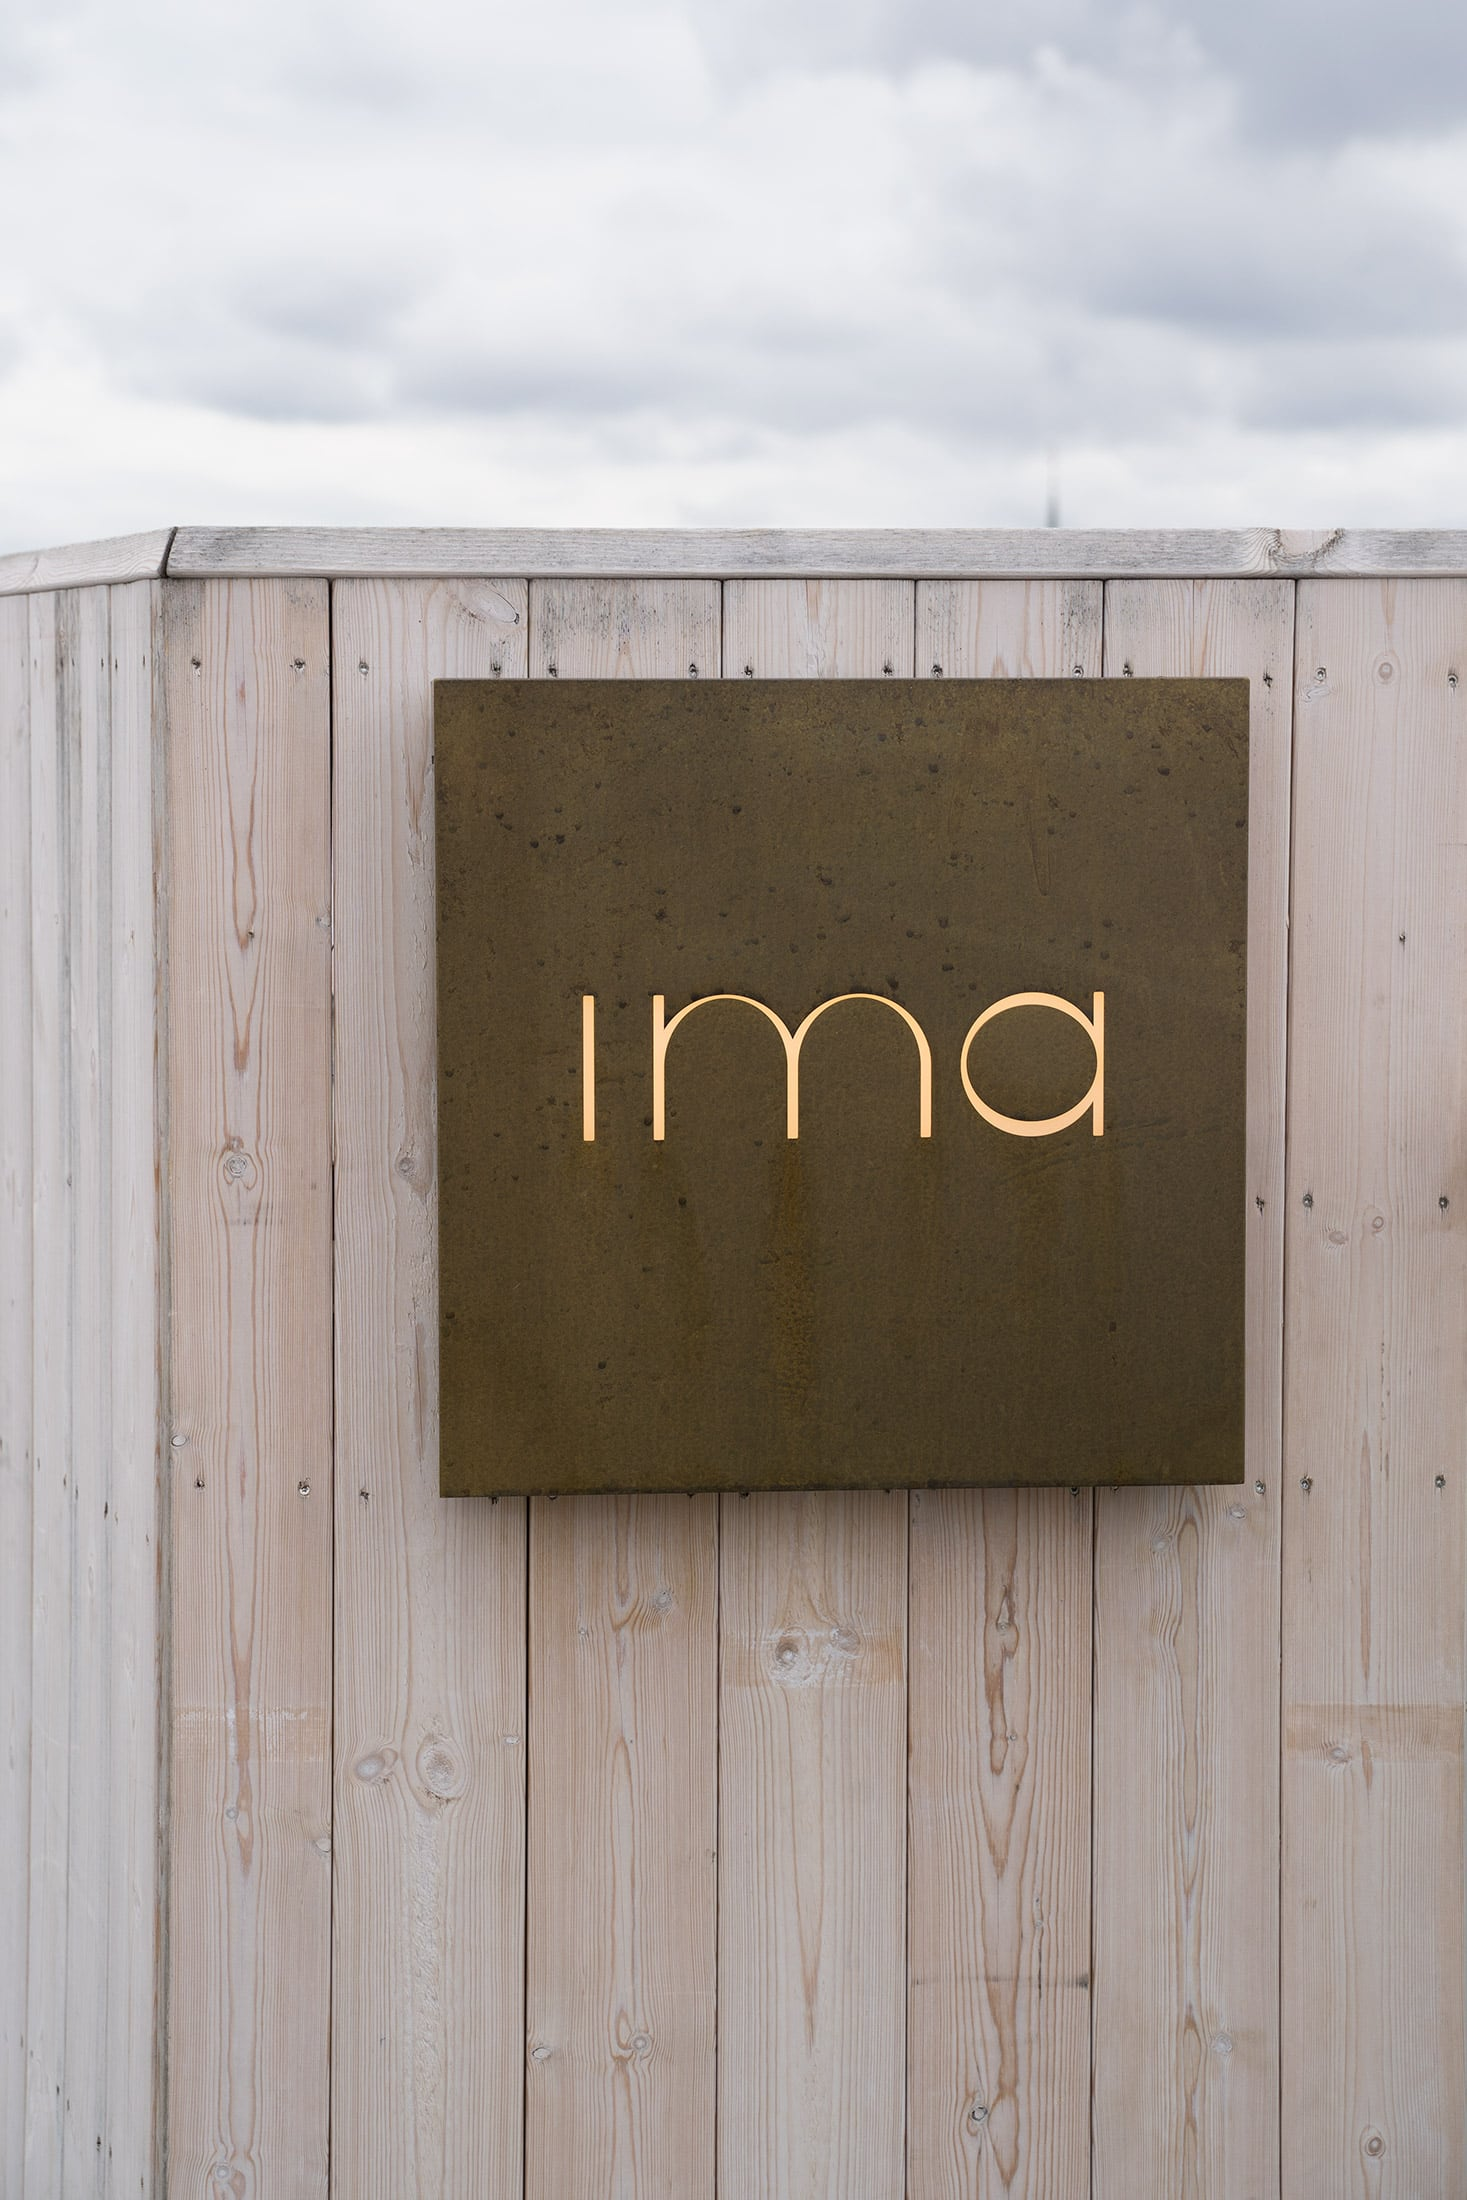 Behind the Amusement Park – IMA signage